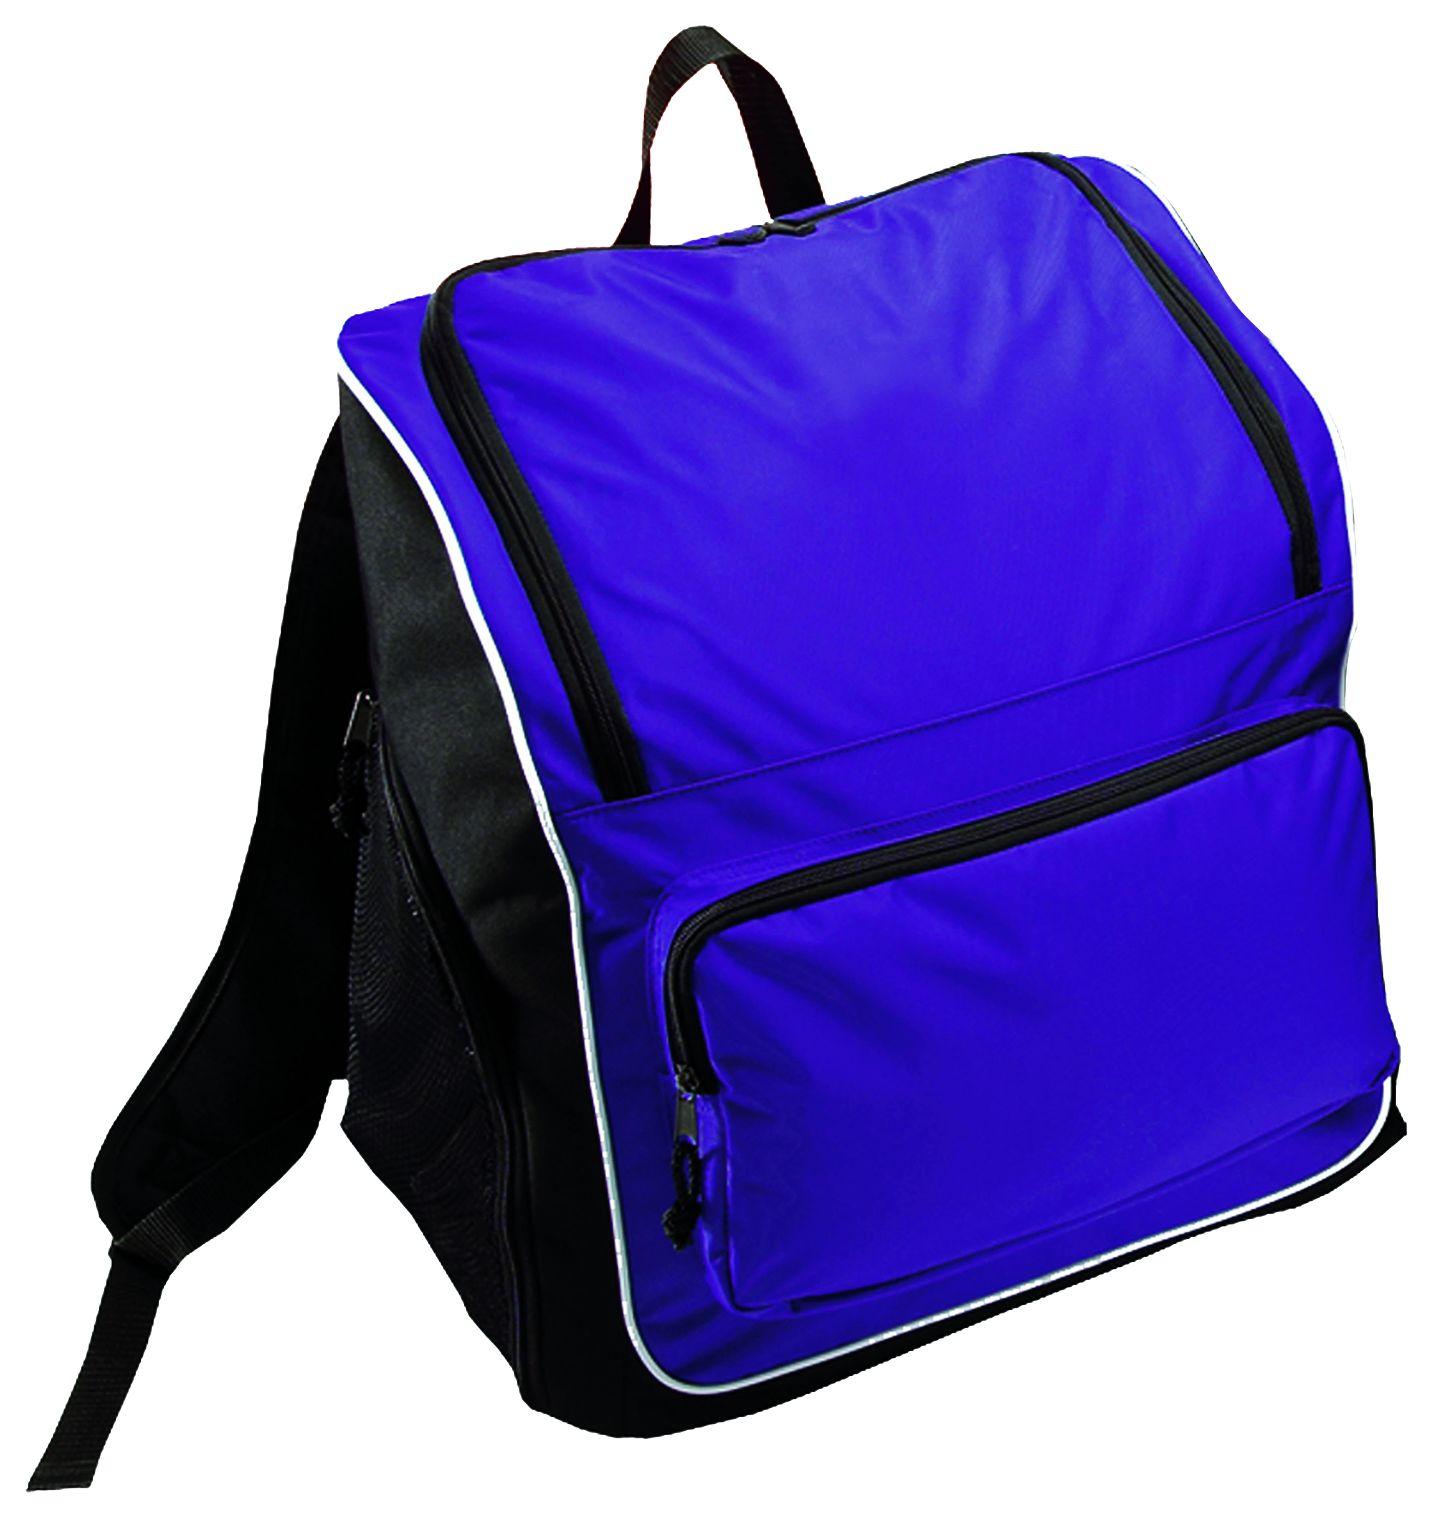 Sportsman Backpack Bag - PURPLE/BLACK/WHITE